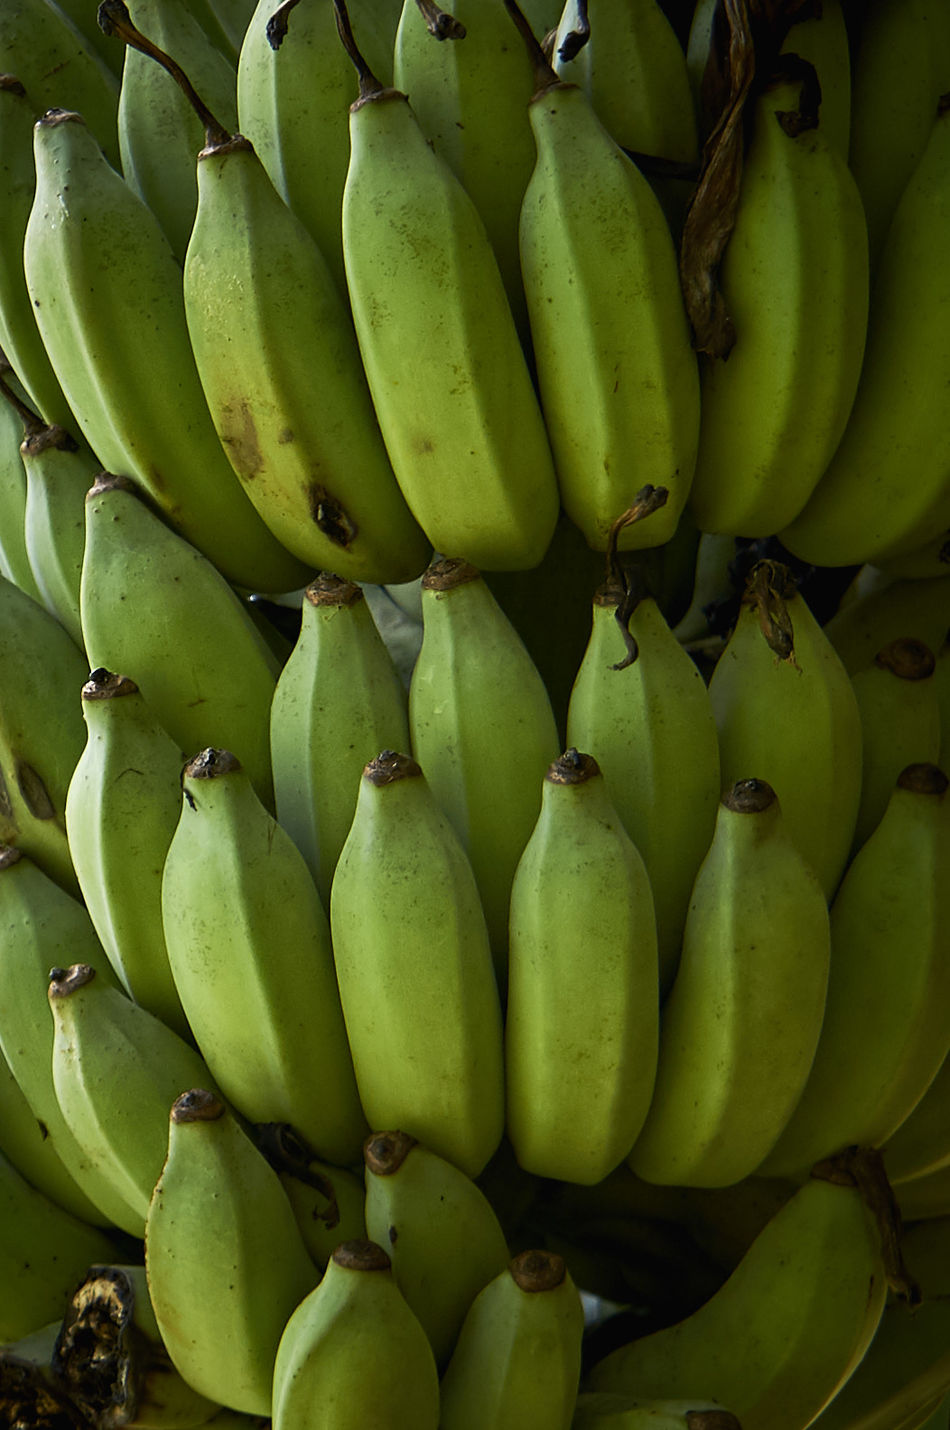 Abundance Banana Banana Banana Tree Bananas Close-up Day Food Food And Drink Freshness Fruit Green Green Color Green Color Healthy Eating Market No People Outdoors Stack Supermarket Tree